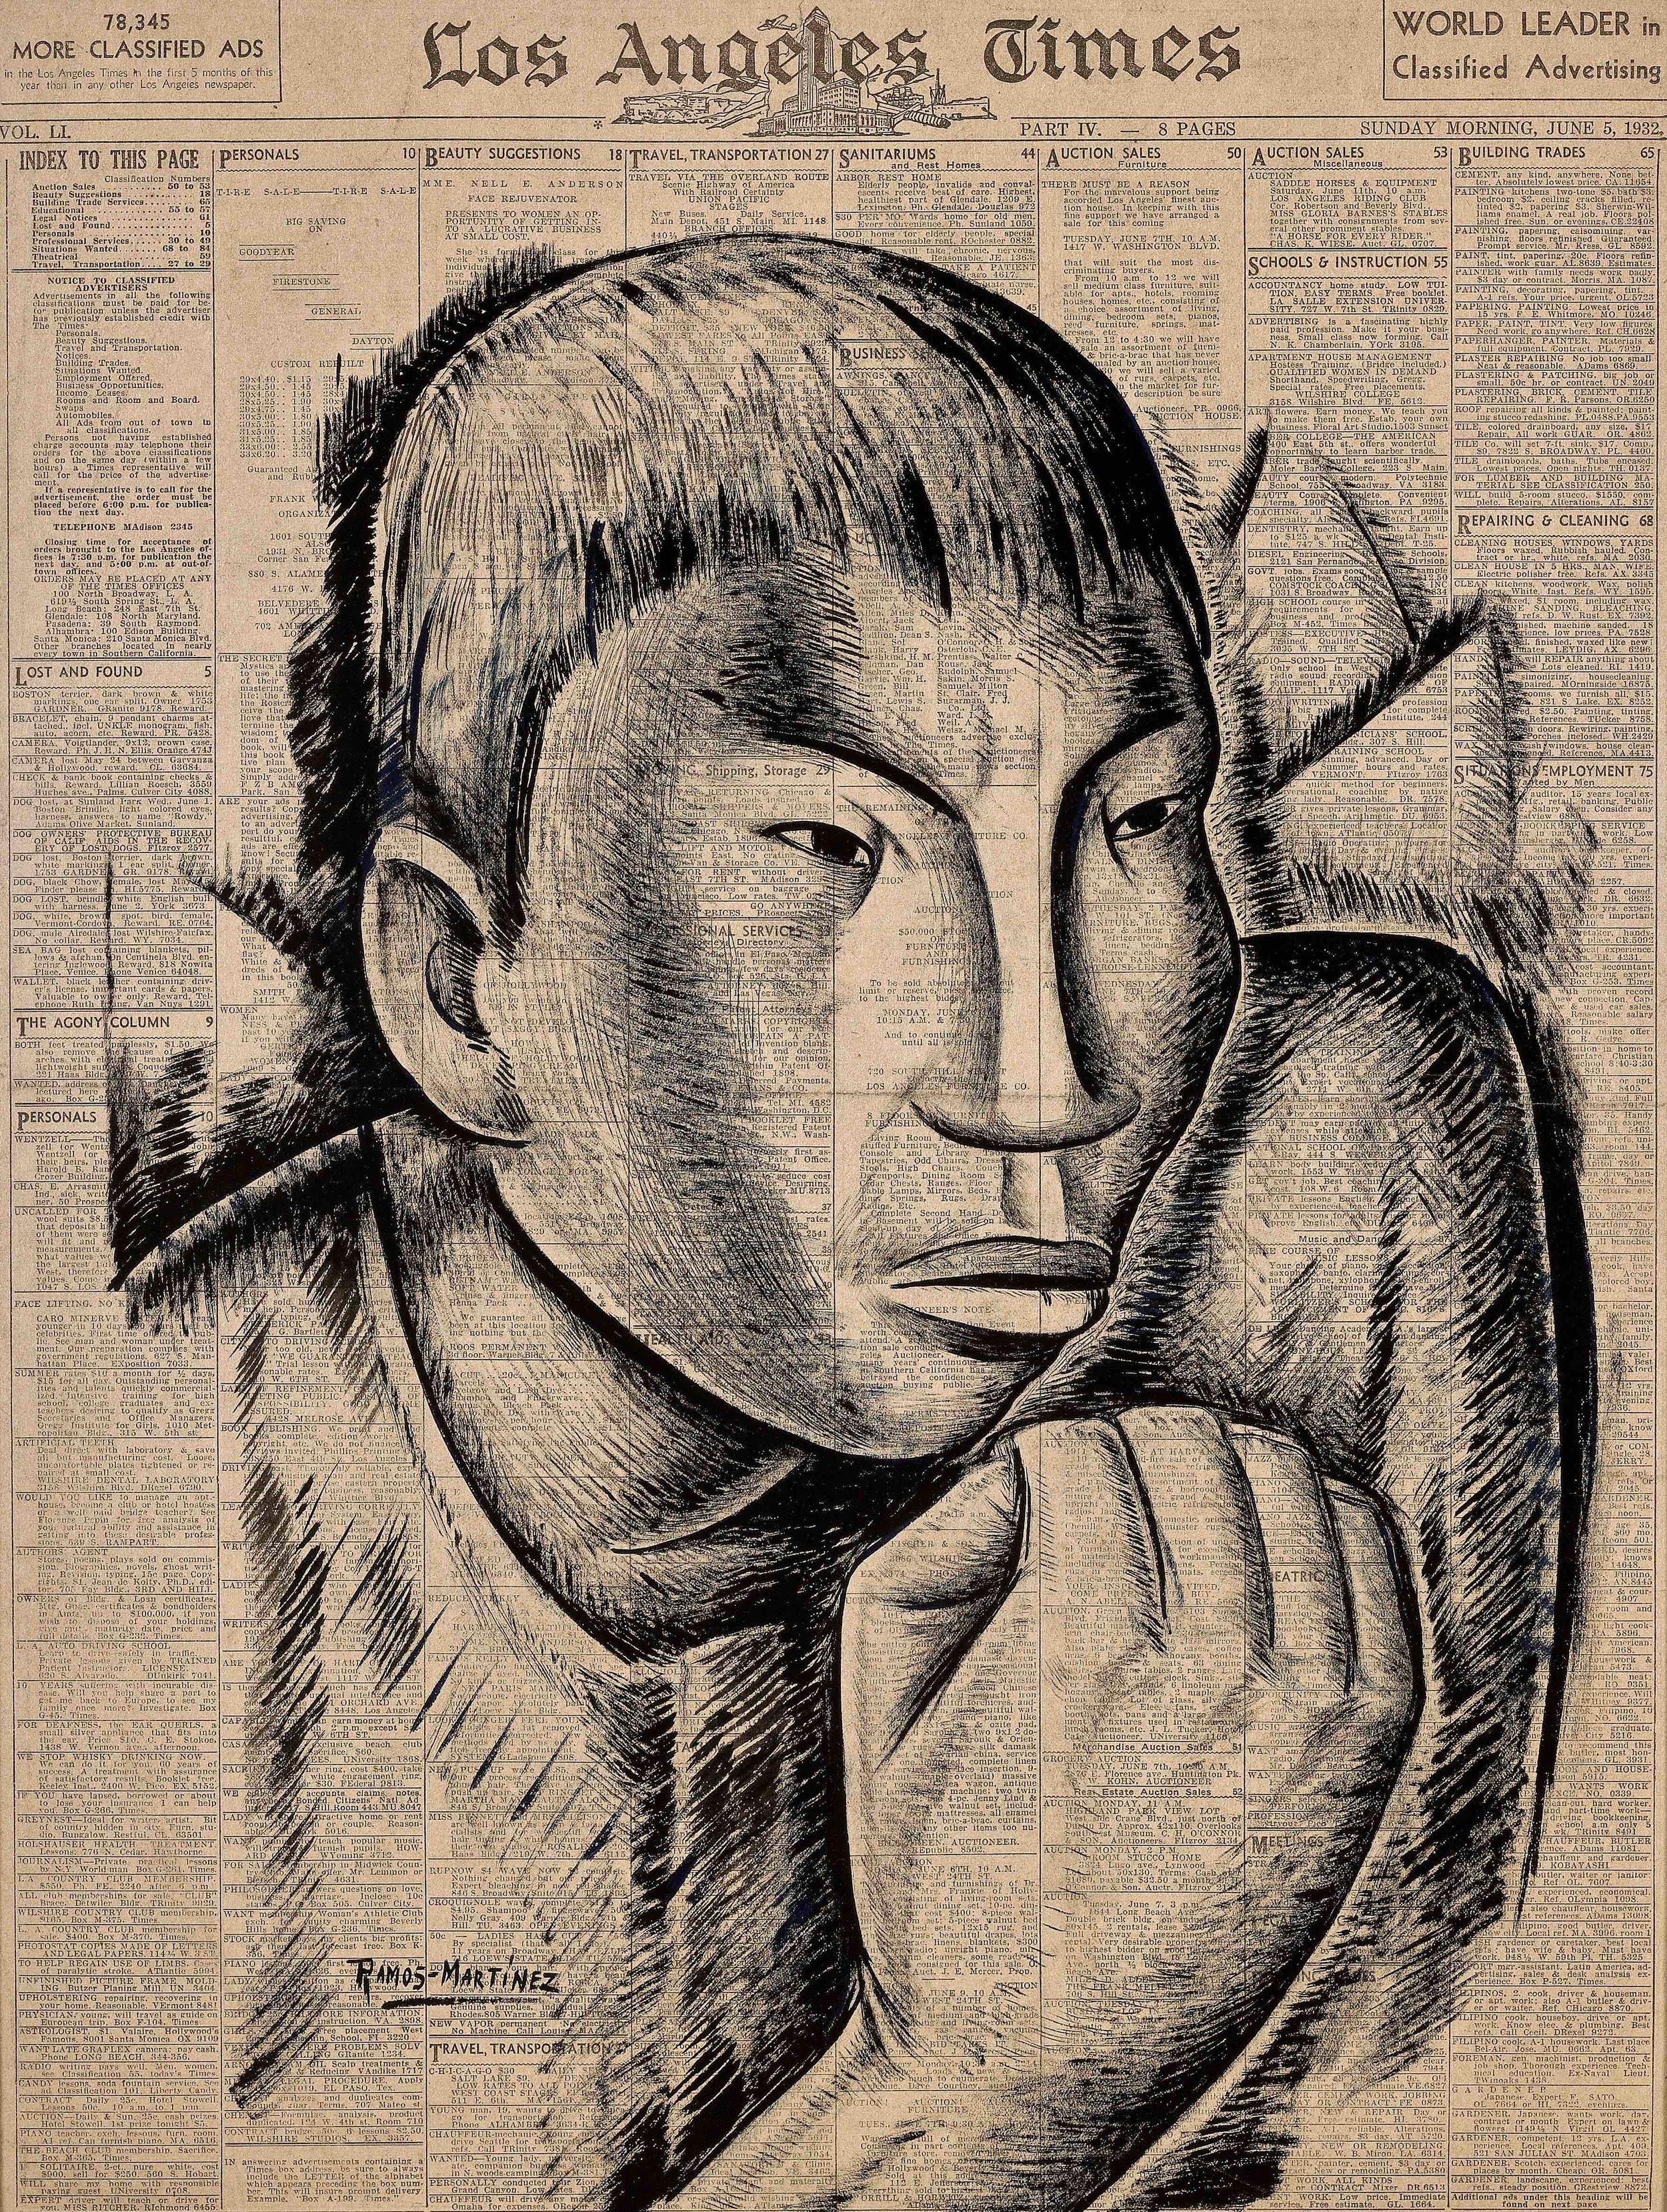 El Defensor / The Protector  1932 tempera and Conté crayon on newsprint / temple y crayon Conté sobre papel periódico ( Los Angeles Times , June 5, 1932) 21 x 15.5 inches / 53.3 x 39.4 centímetros Private collection